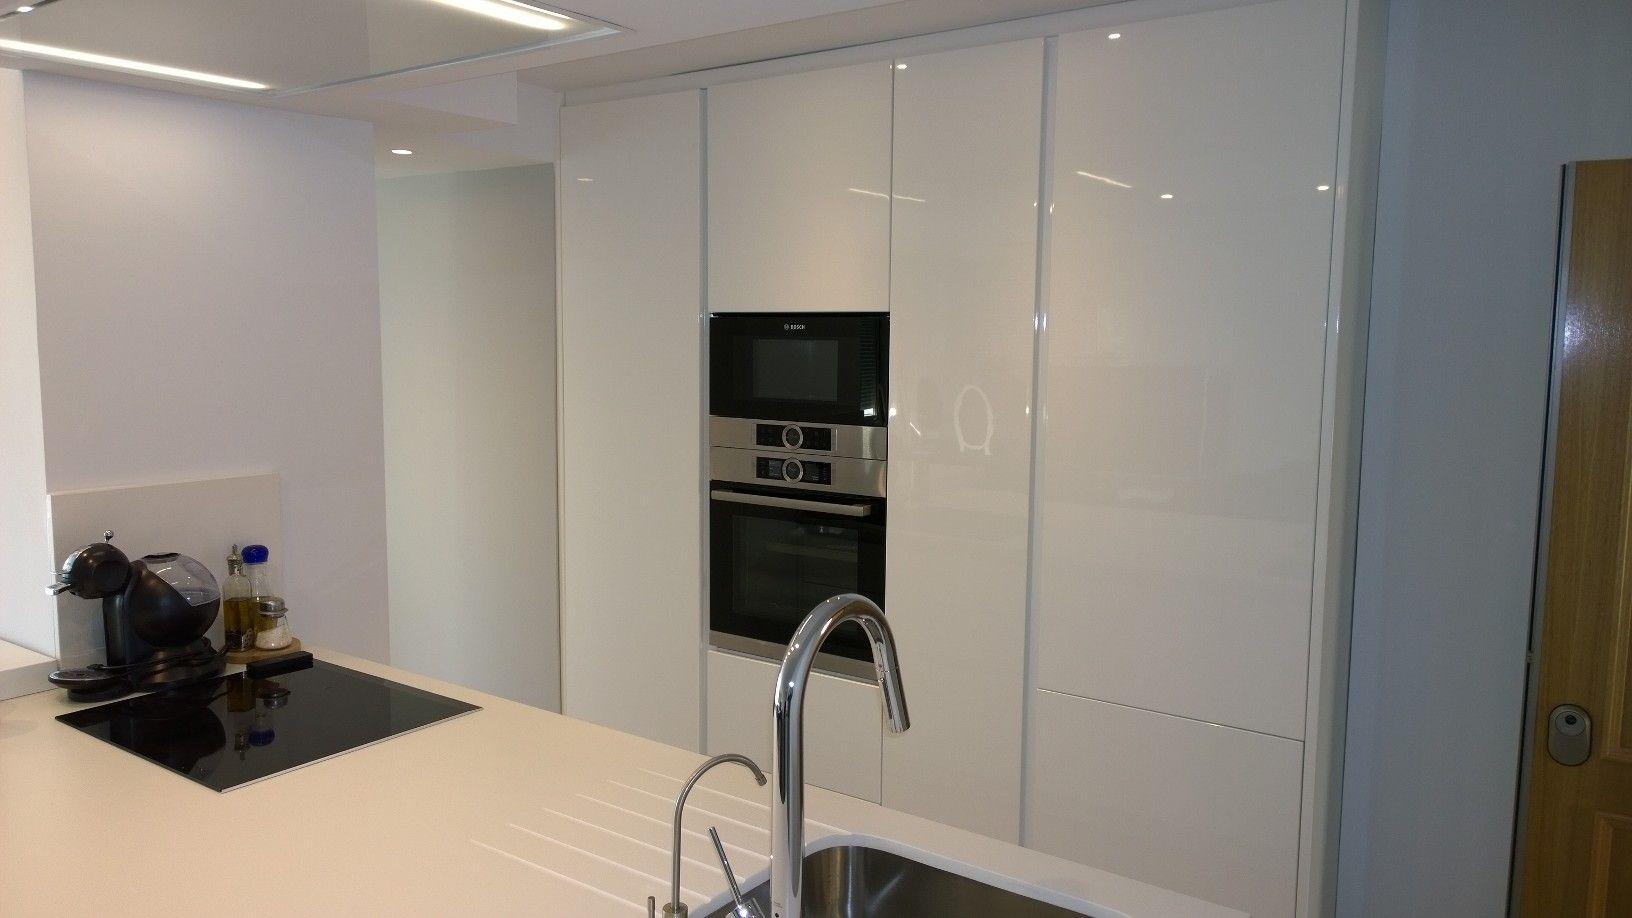 Cocina de 2a kutchen modelo nua lacado blanco brillo - Campana de cocina ...